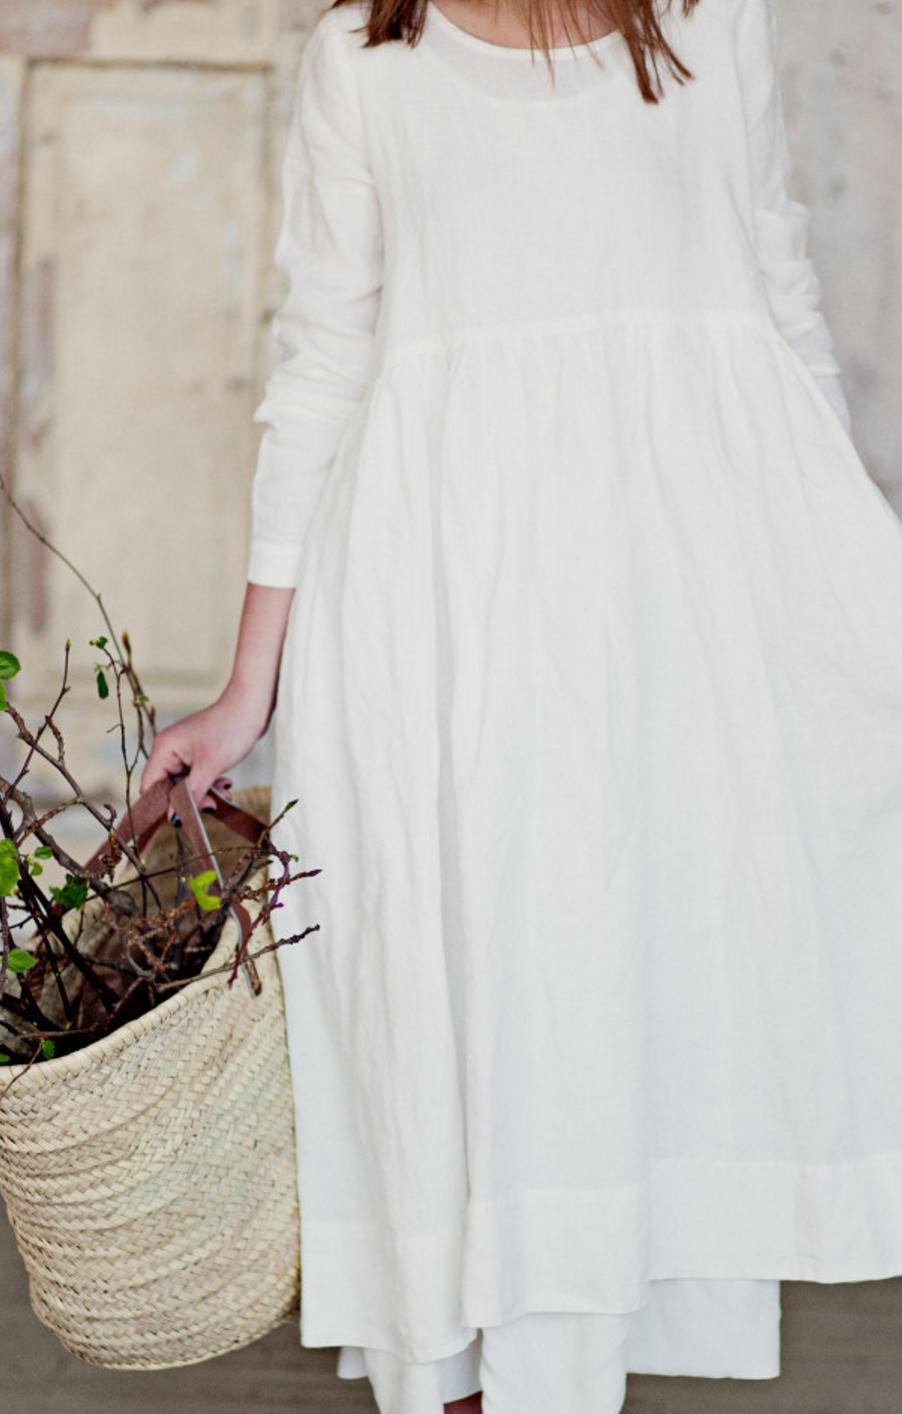 handmade linen dresssondeflorshop on etsy | kleidung